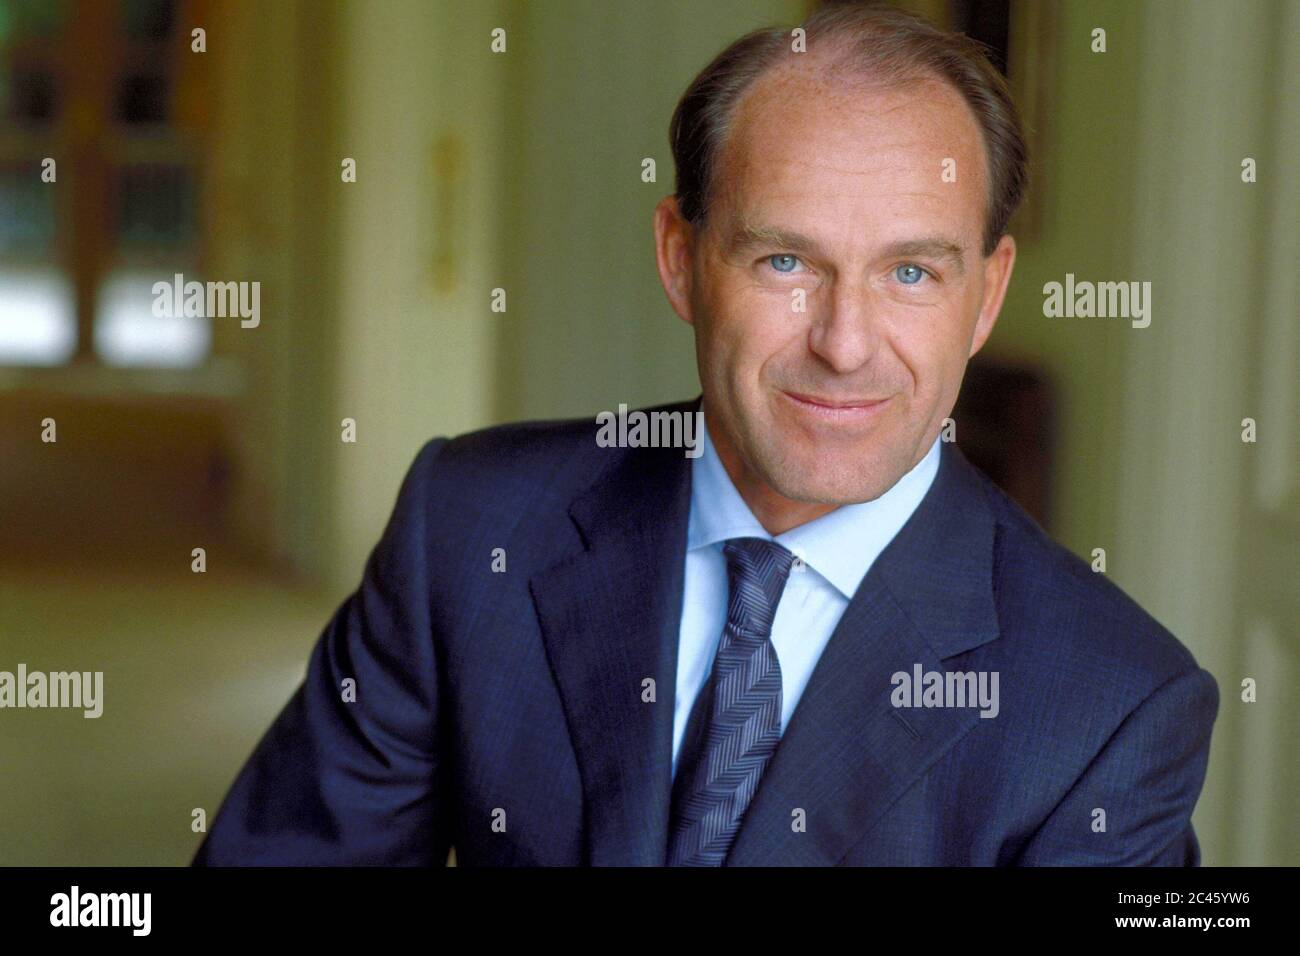 Karl-Erivan W. Haub - Managing Director of Tengelmann Holding Stock Photo